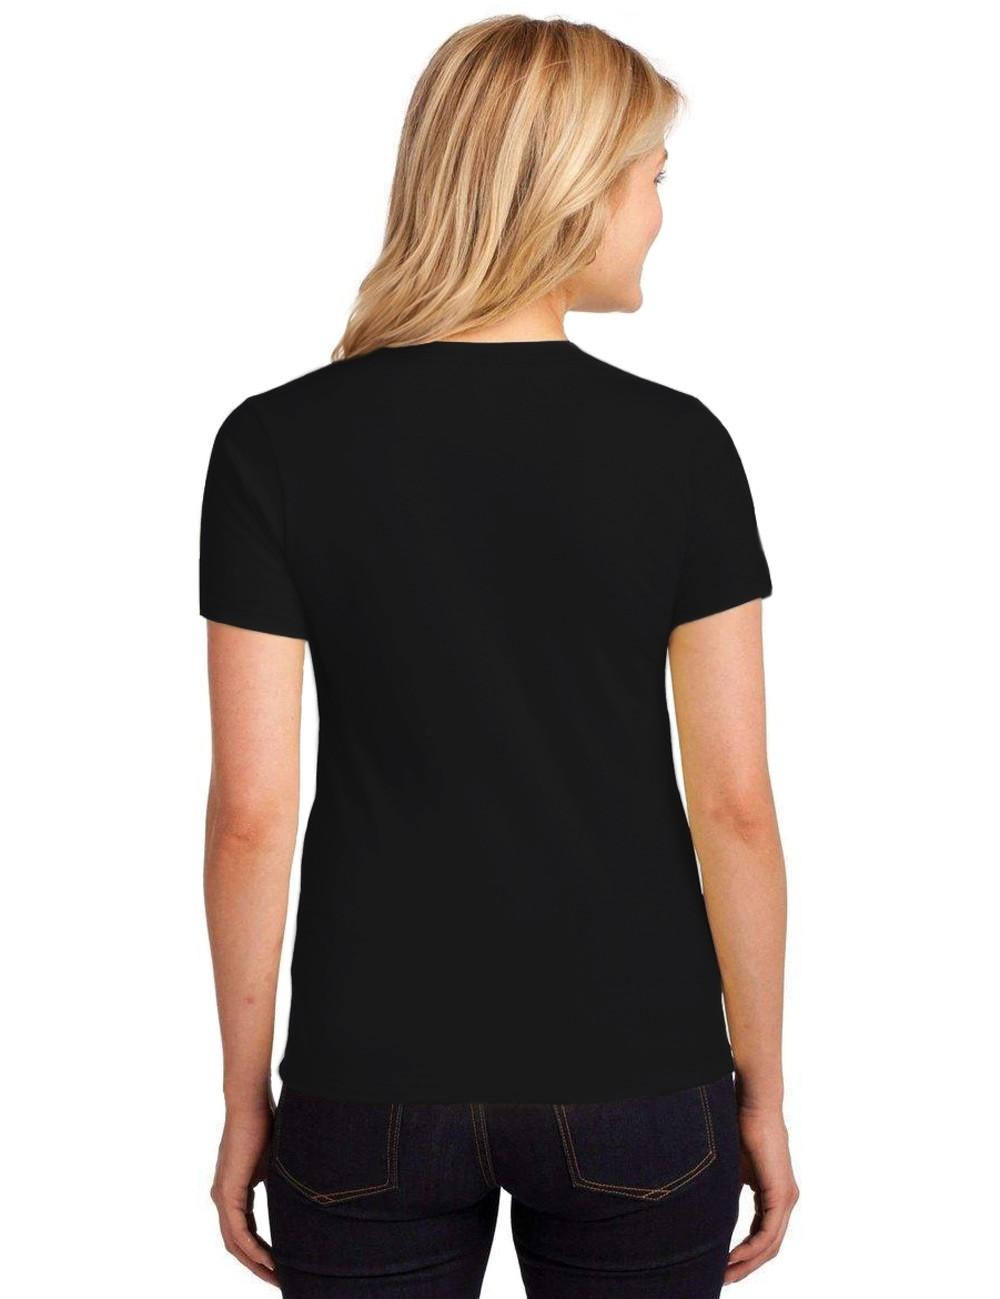 Camiseta Feminina T-Shirt I Want To Believe Baby Look ER_034